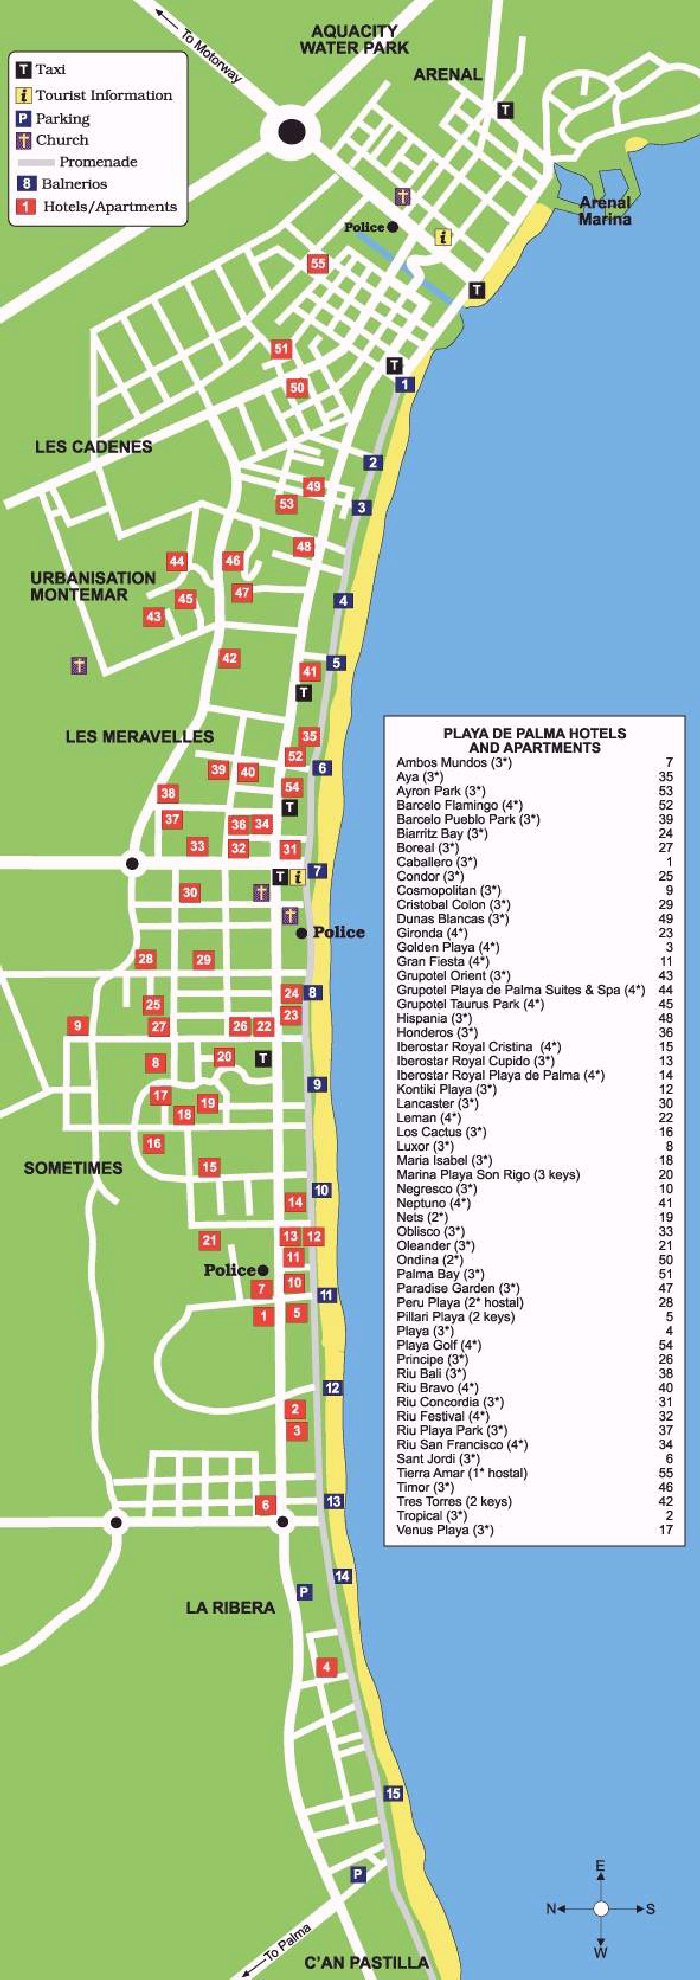 playa de palma karte Playa de Palma Street Map and Travel Guide playa de palma karte